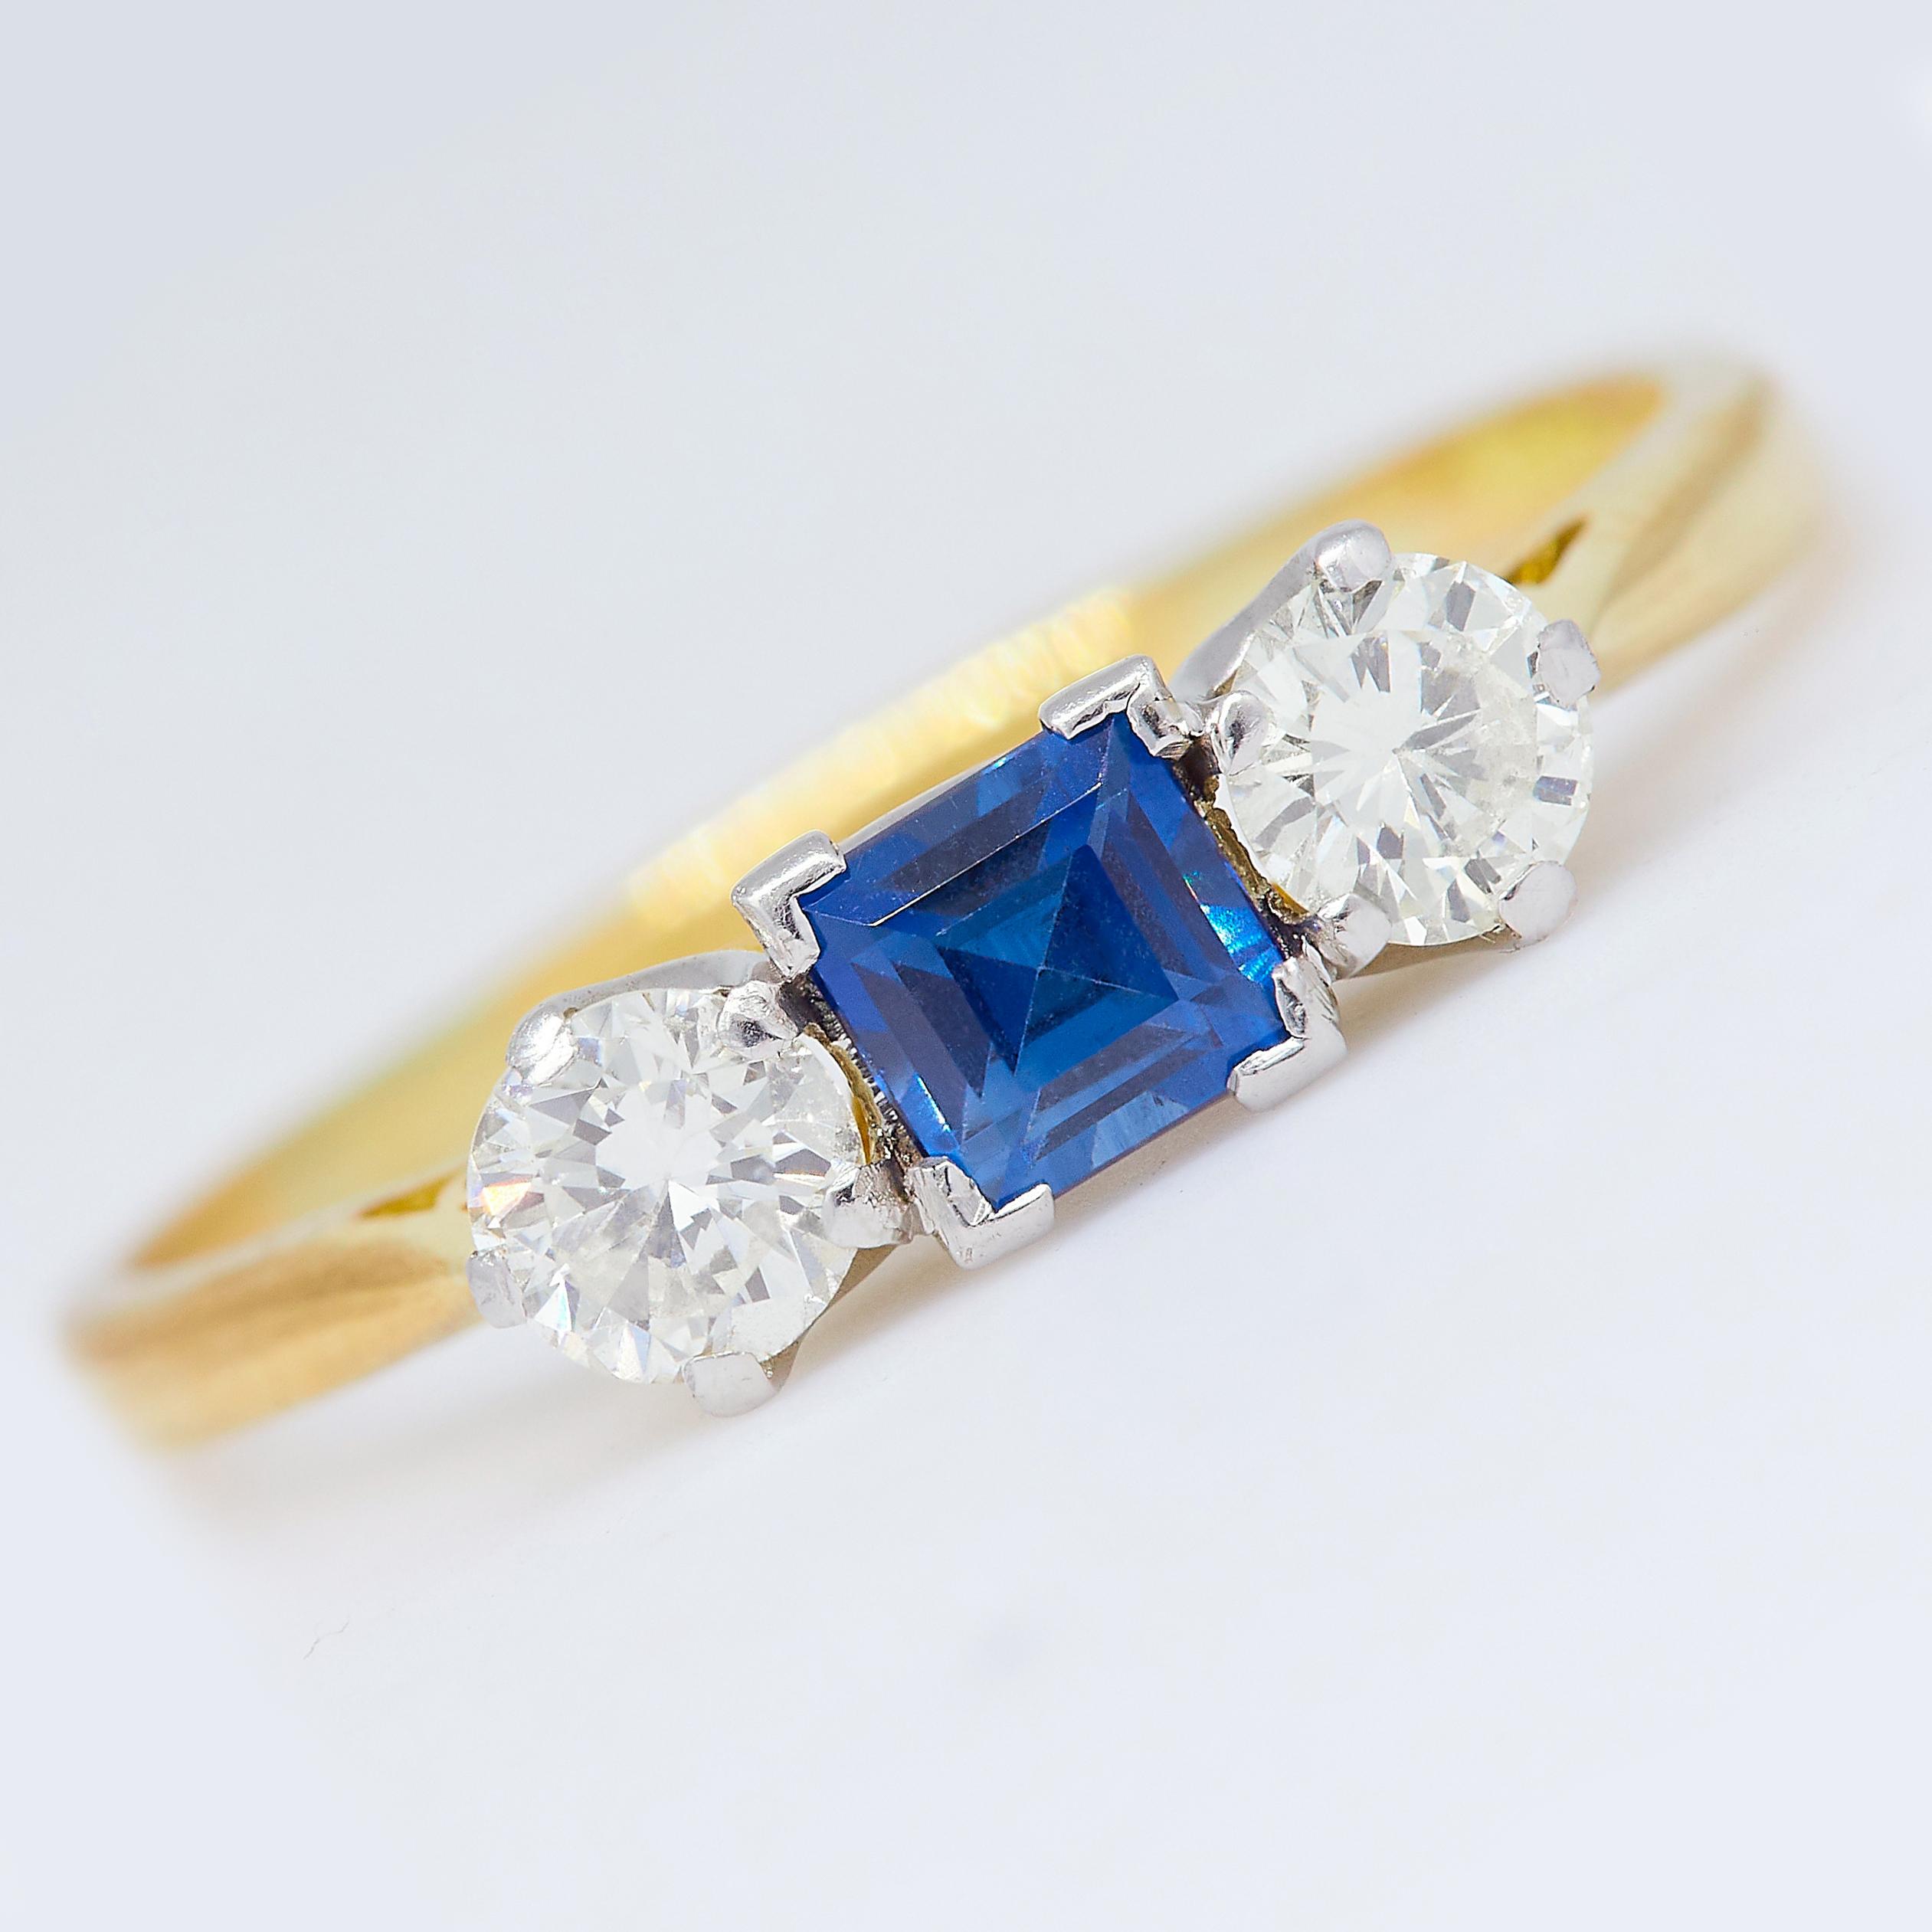 SAPPHIRE AND DIAMOND 3-STONE RING